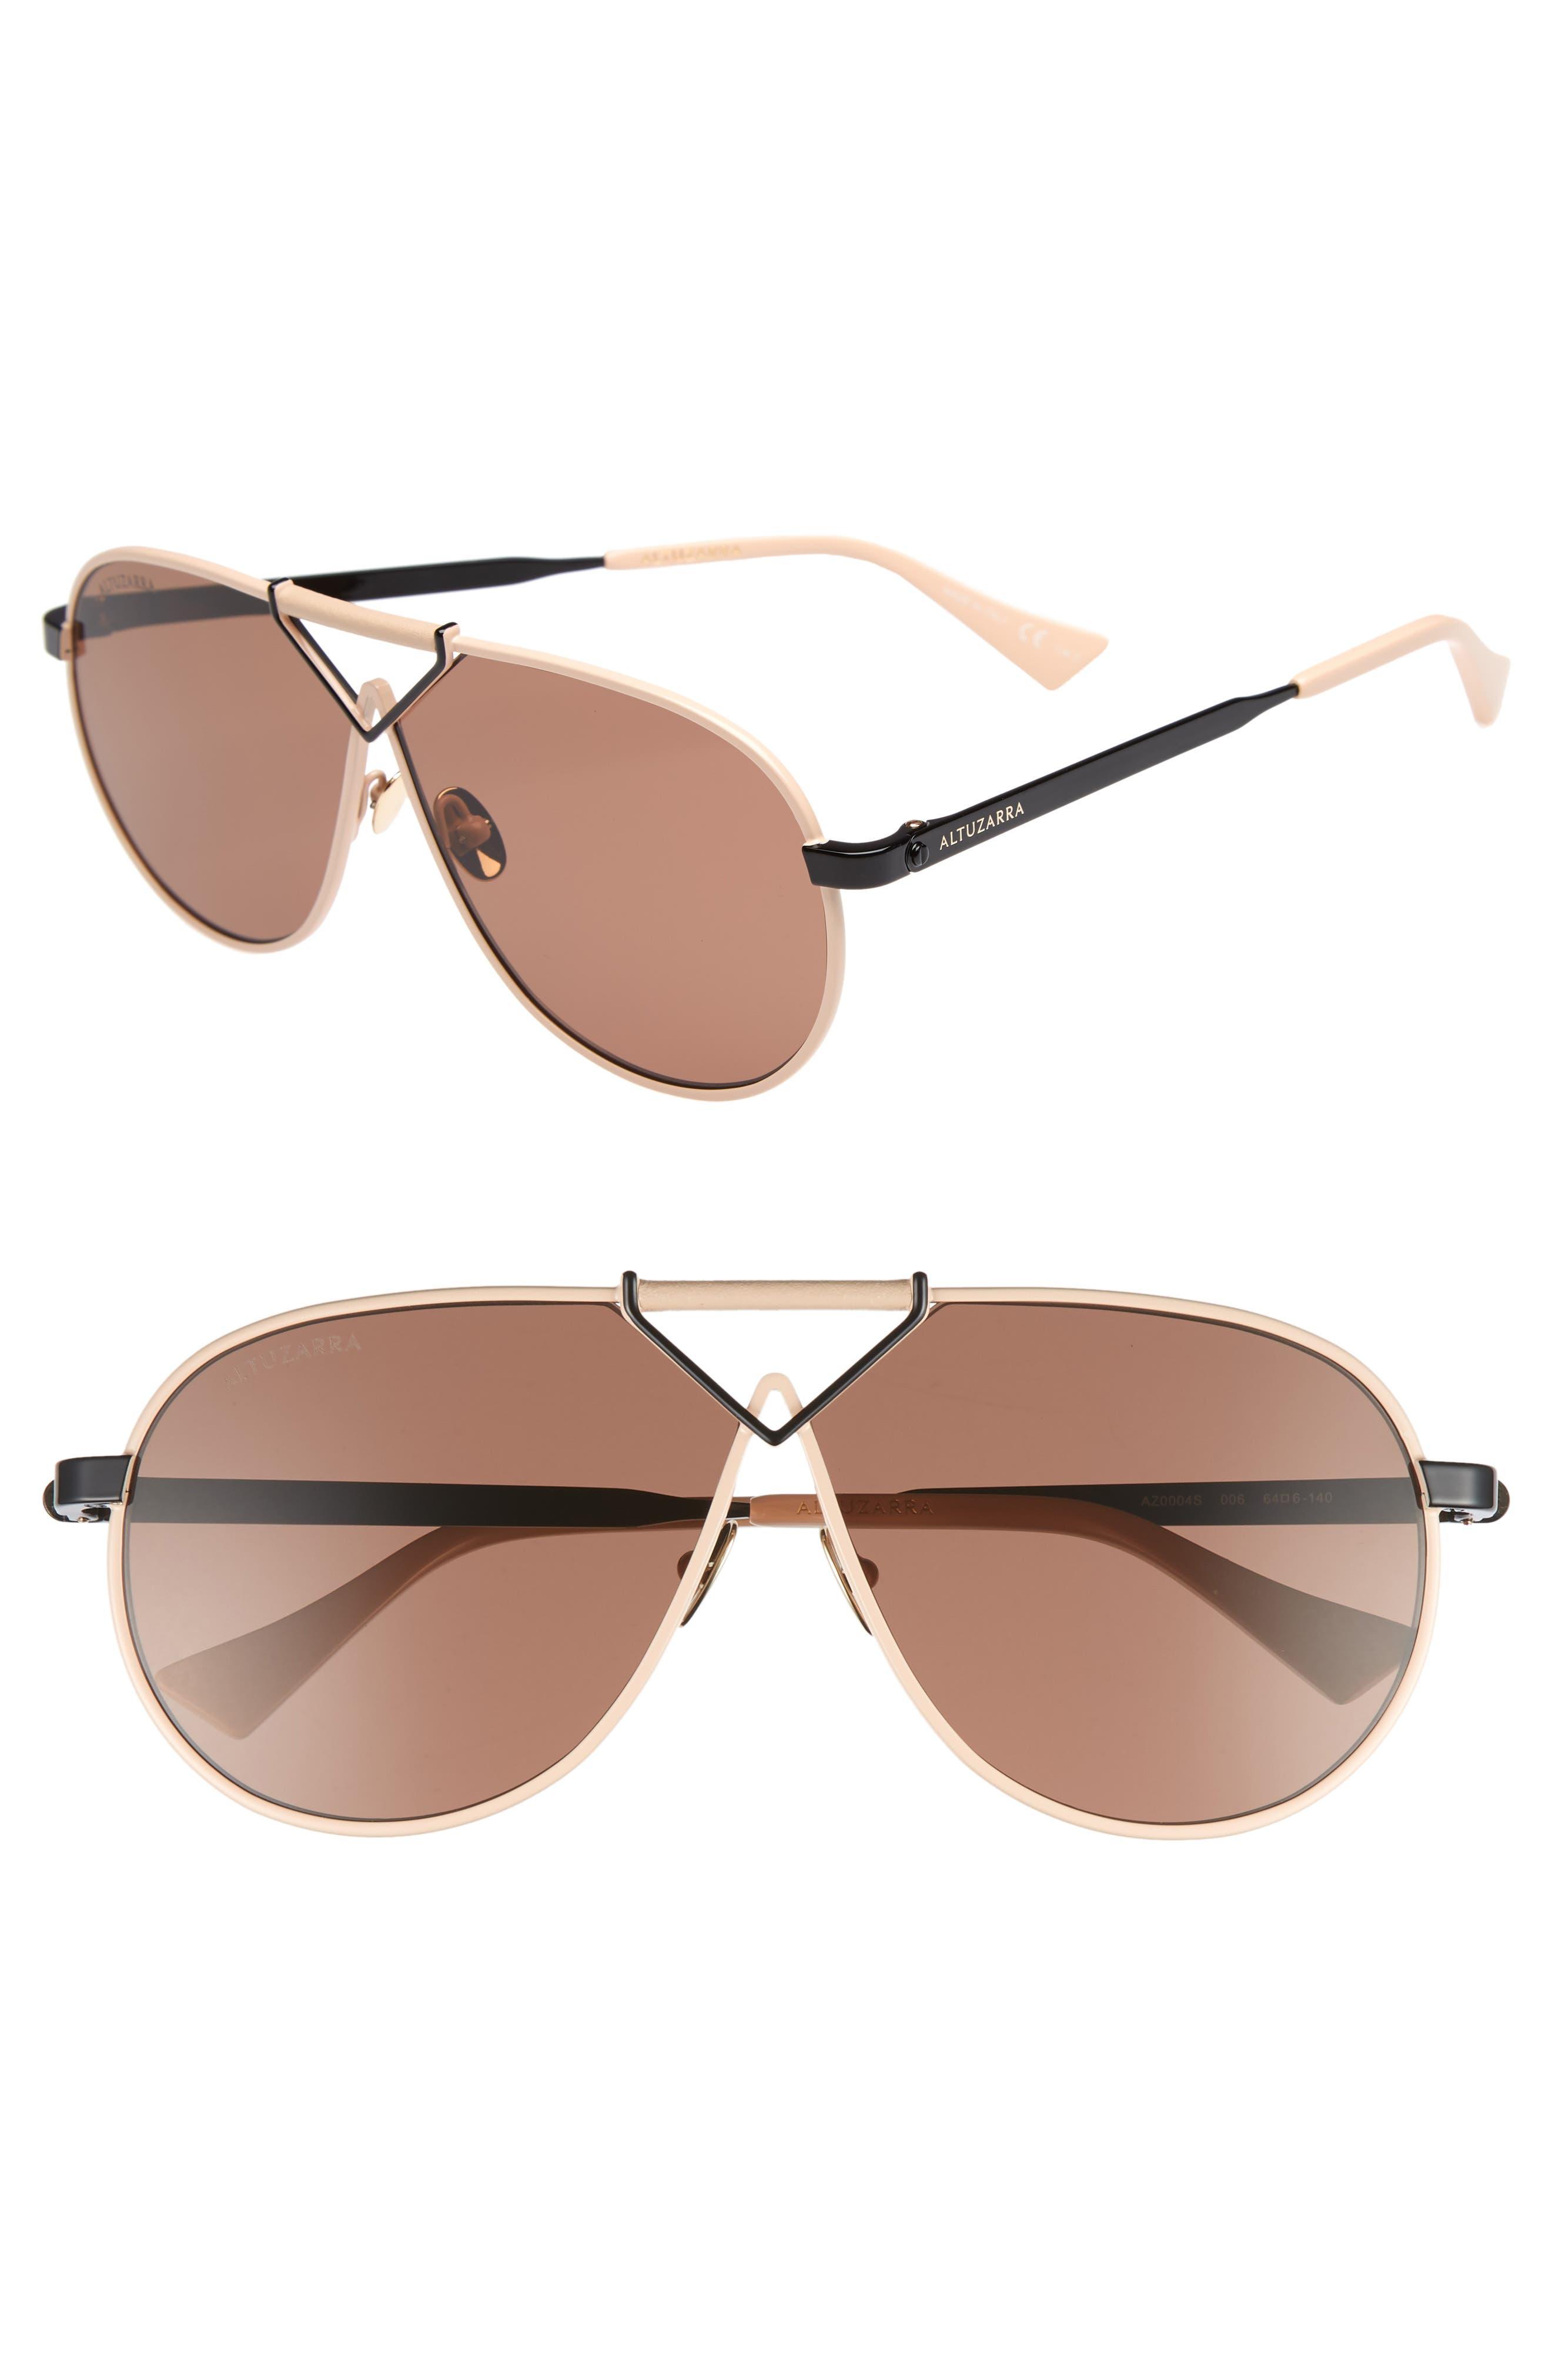 Altuzarra 64mm Aviator Sunglasses